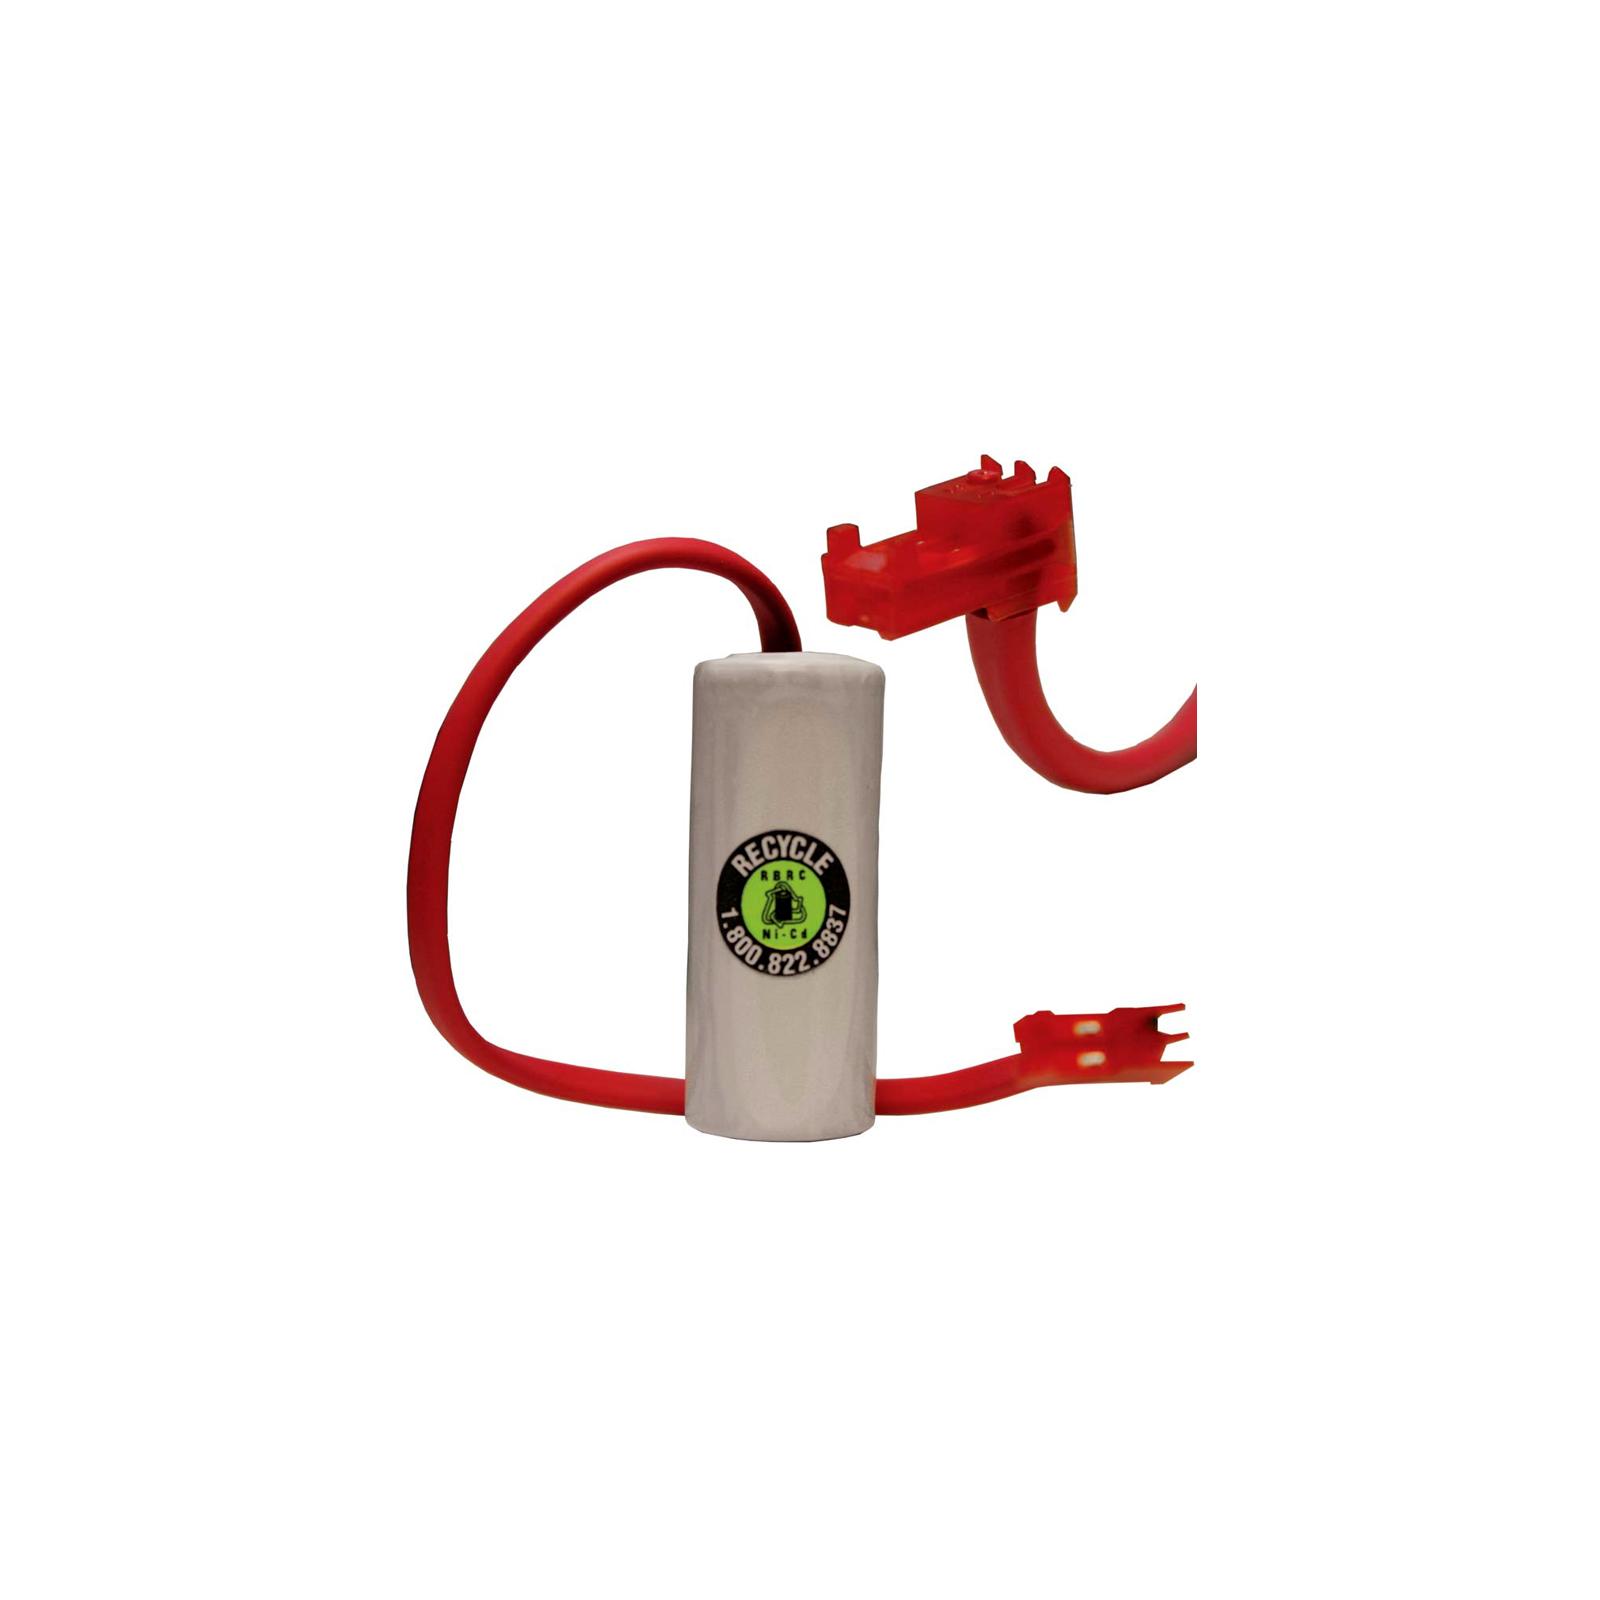 Lithonia Lighting Emergency Light Battery